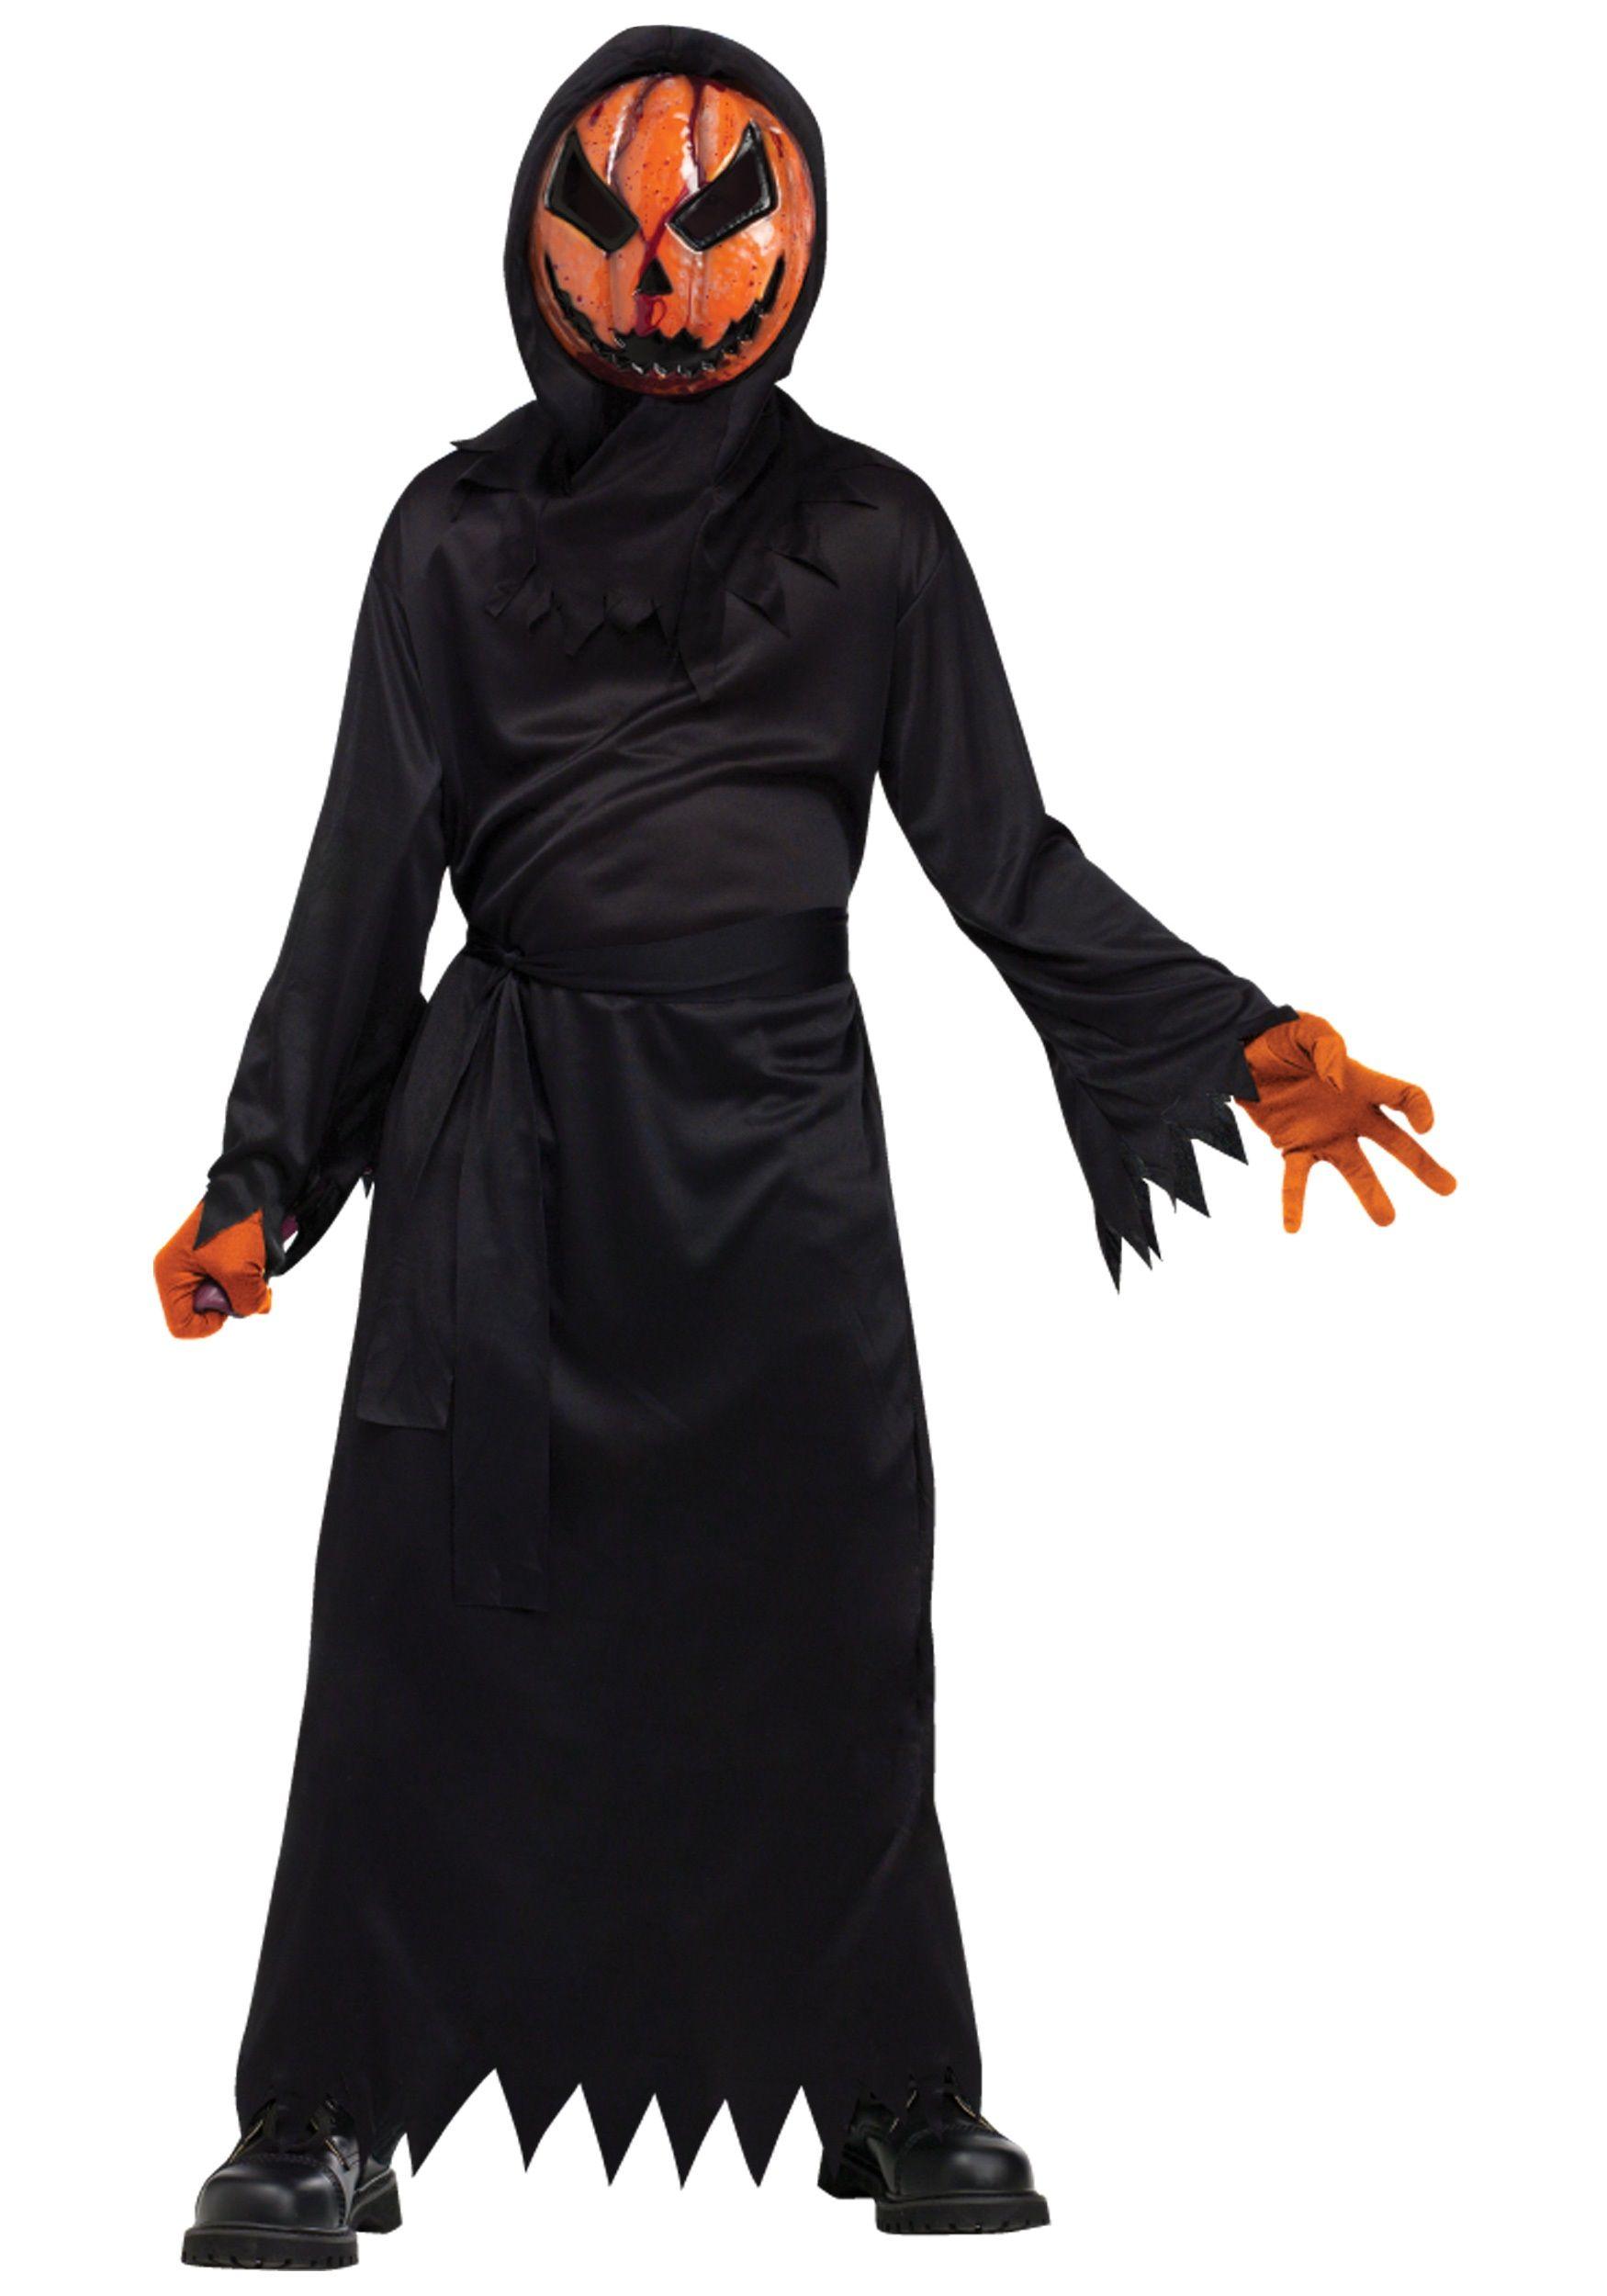 scary halloween costumes | scary pumpkin halloween costume